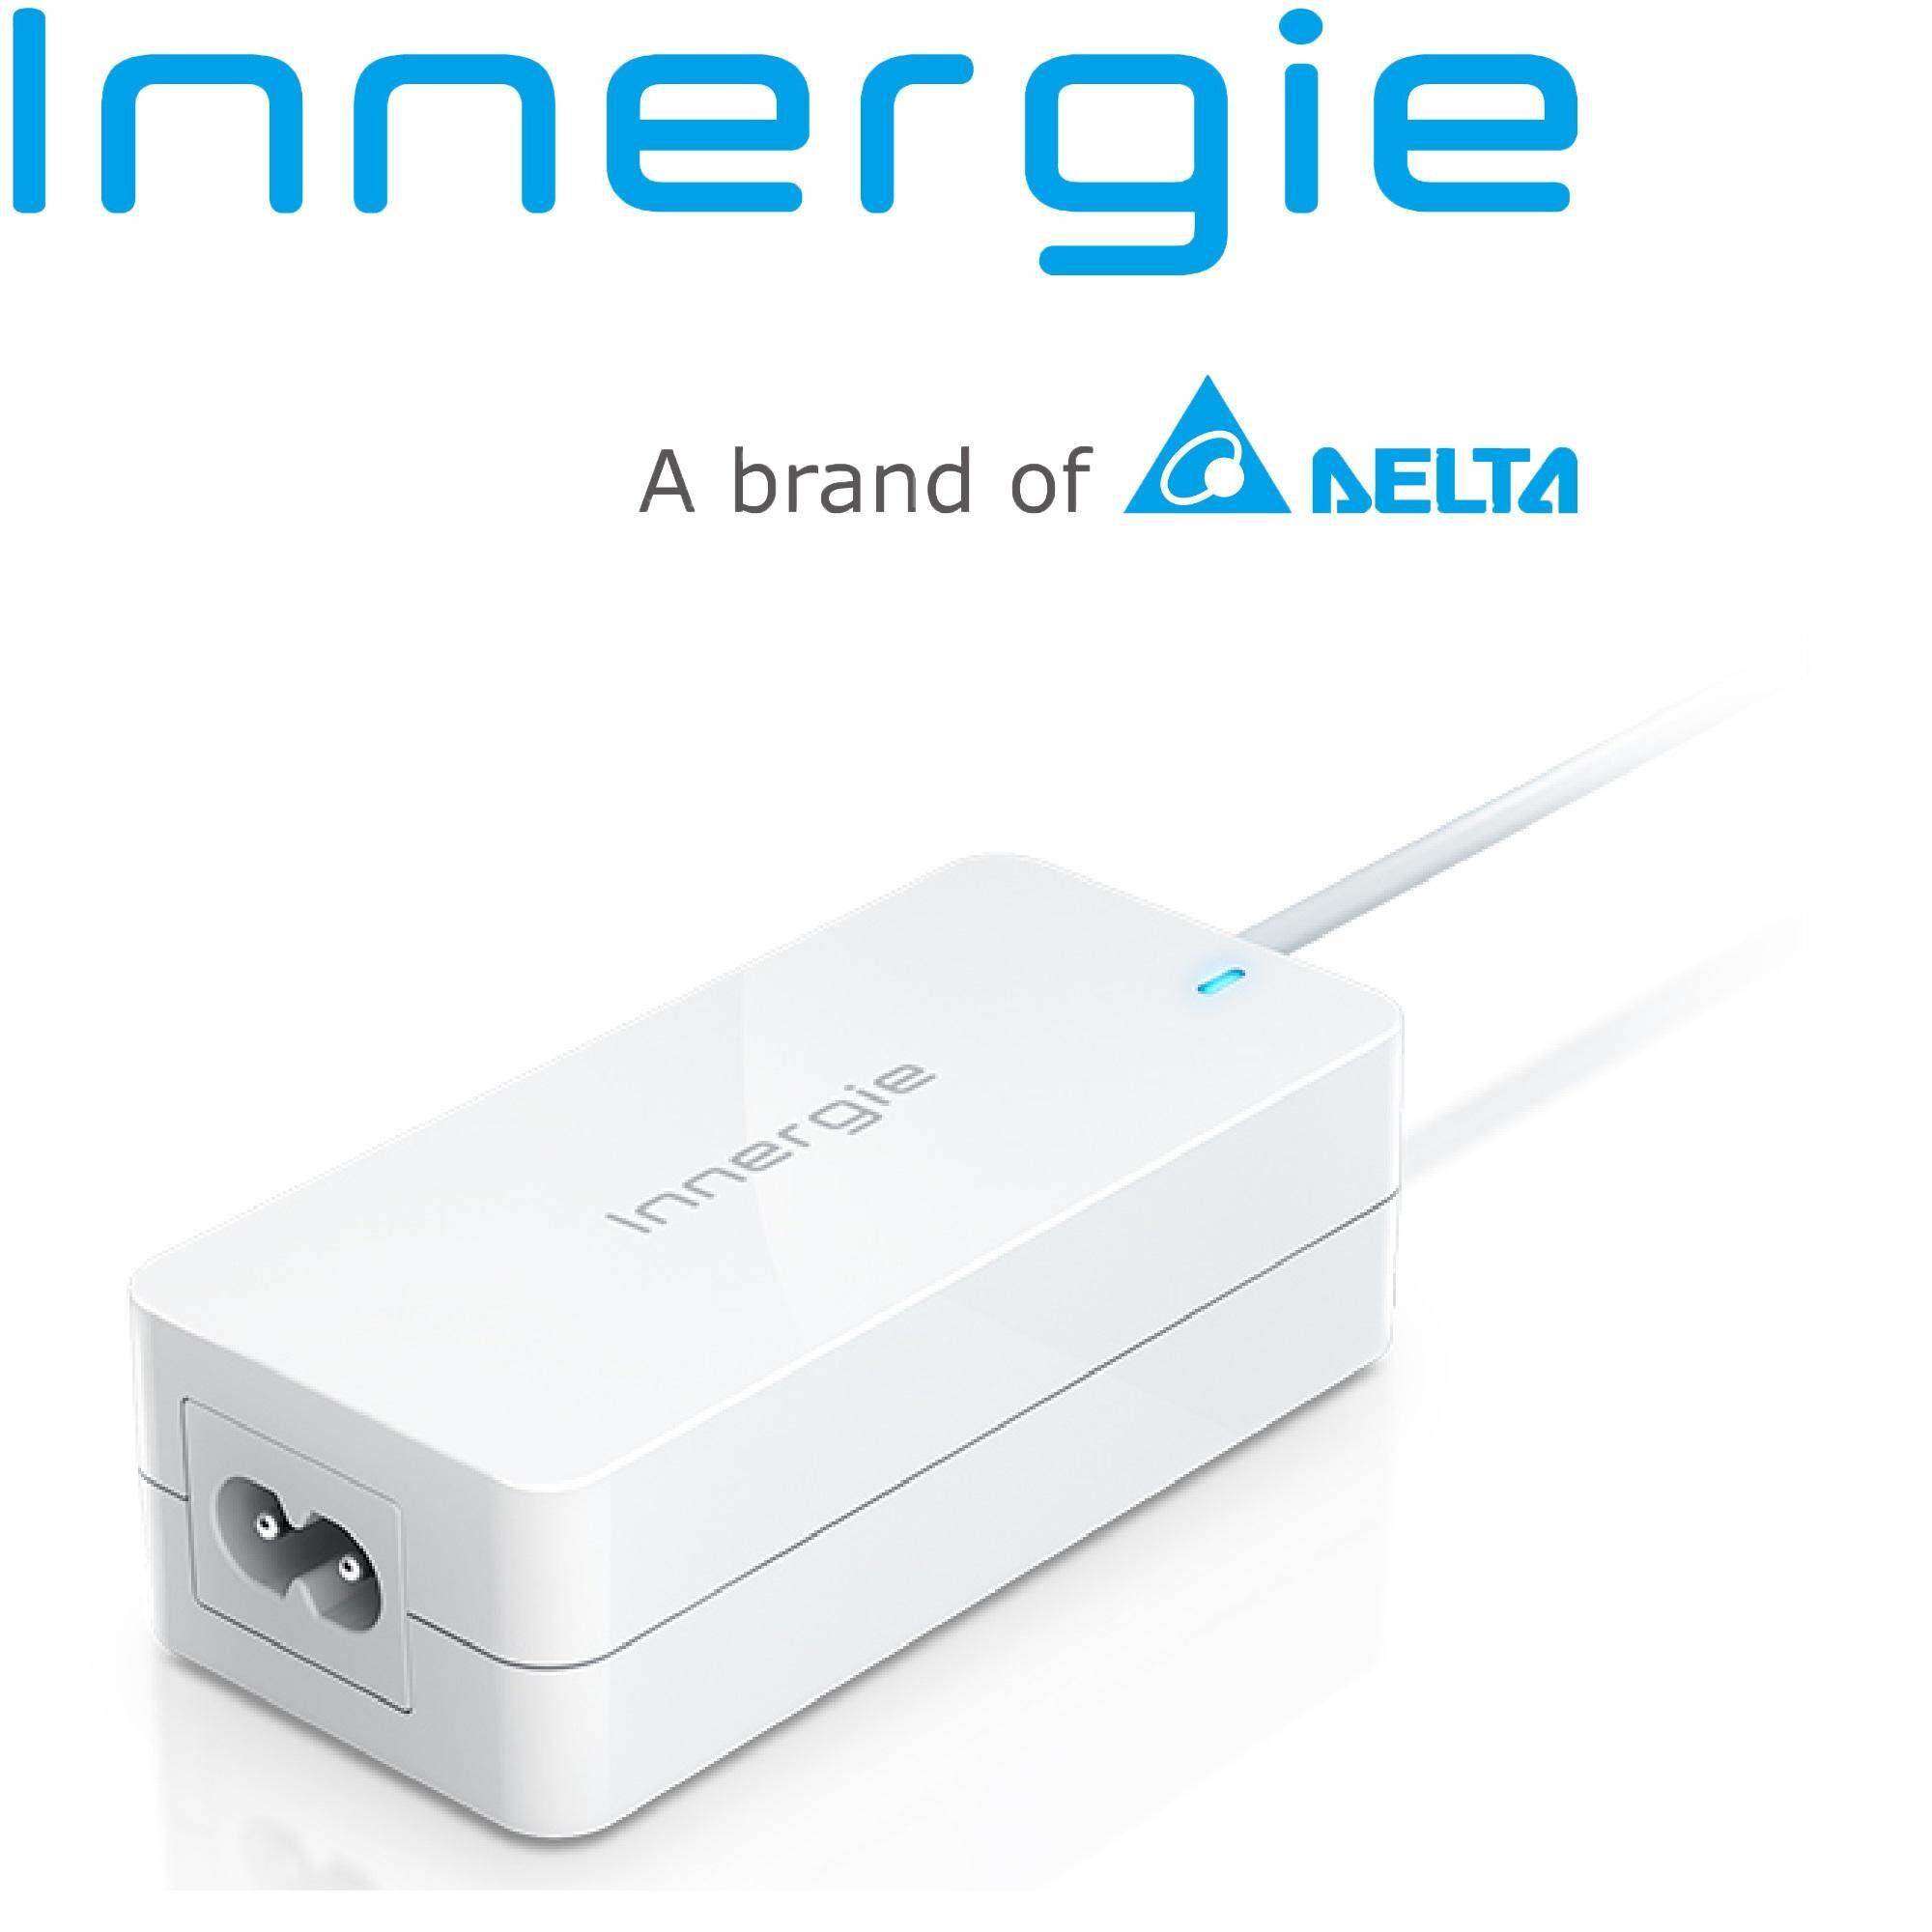 PowerGear 65W Universal Laptop Adapter (UK PLUG) - WHITE COLOR